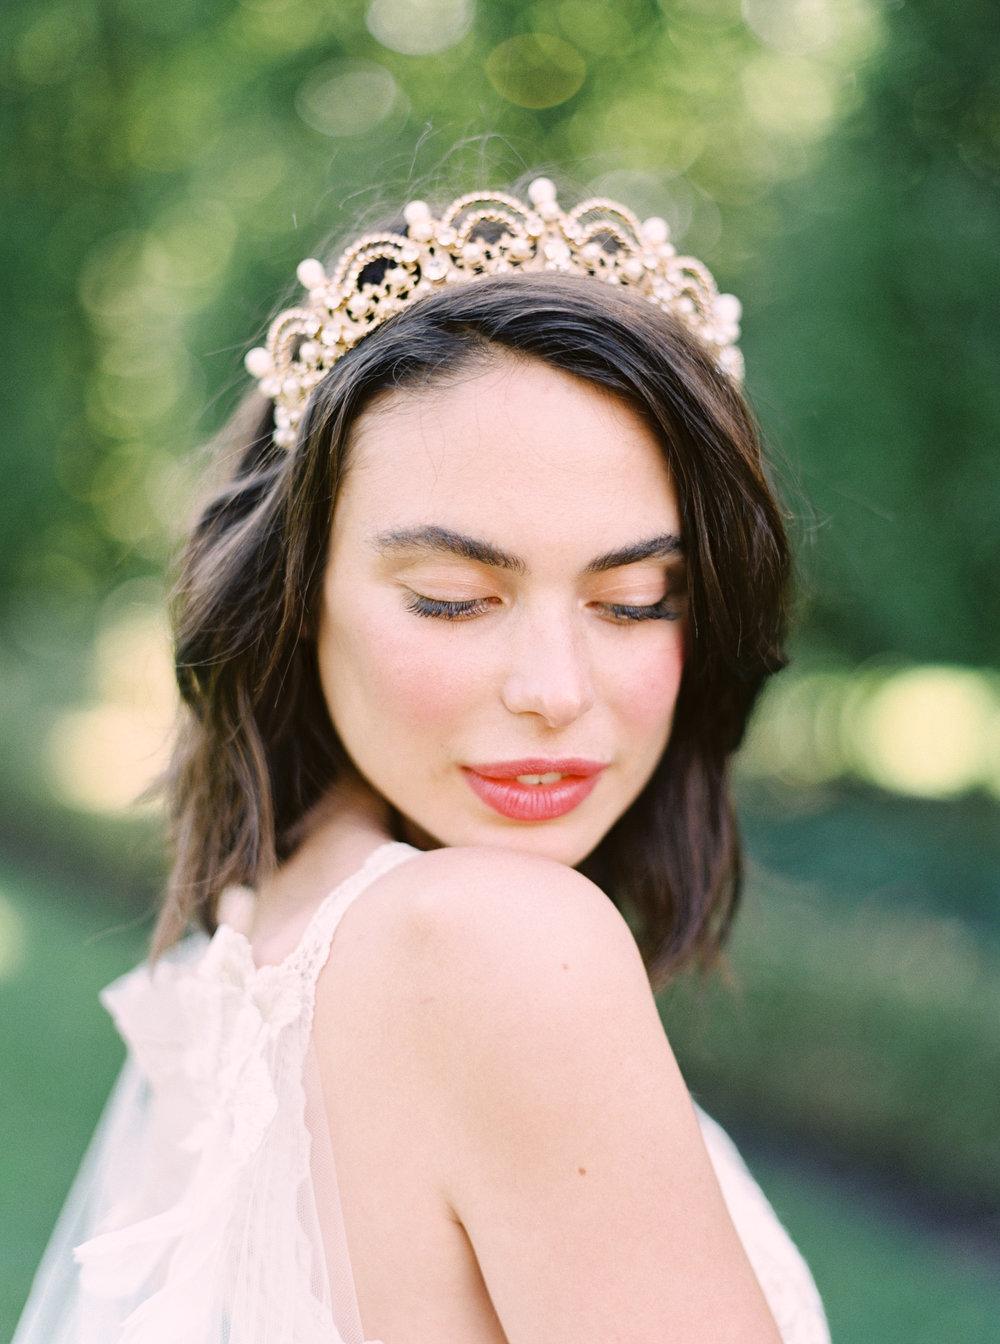 Toronto Wedding Photographer - Fine Art